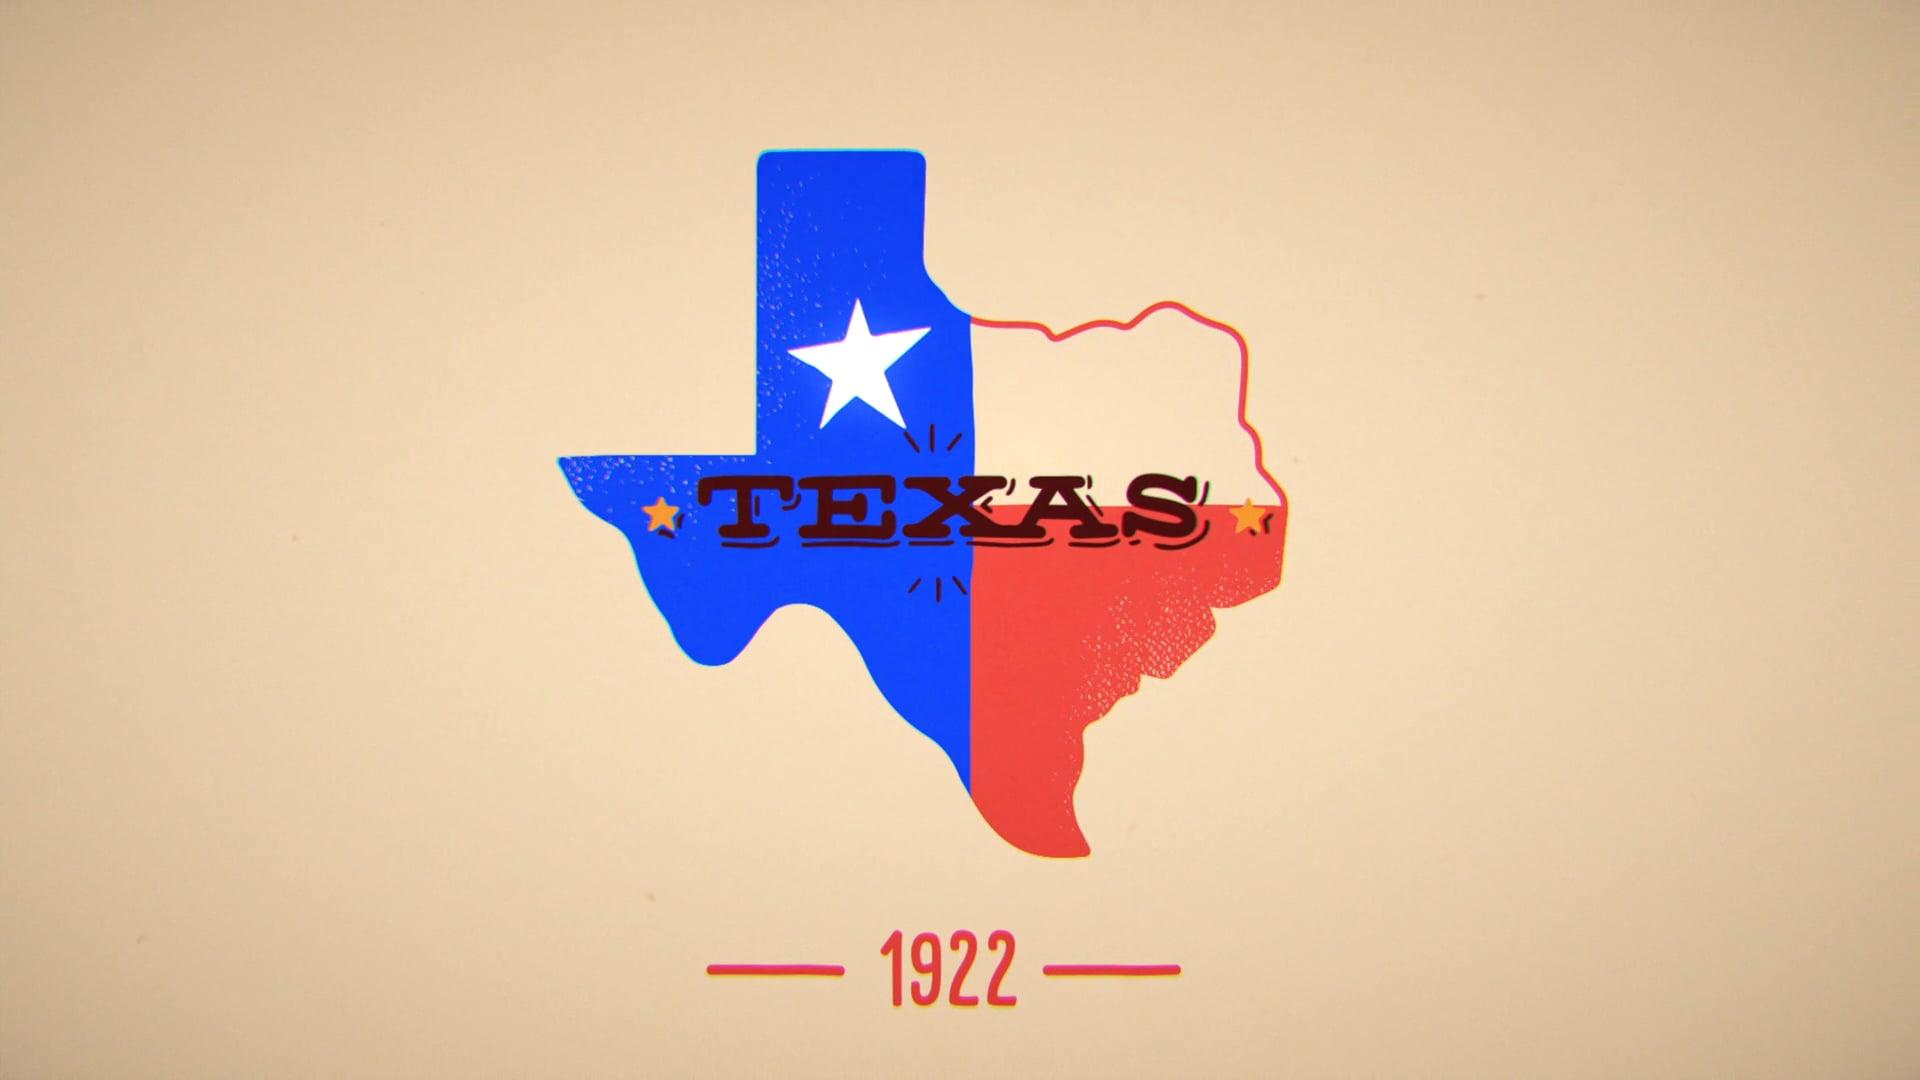 CBS Texas College Football History